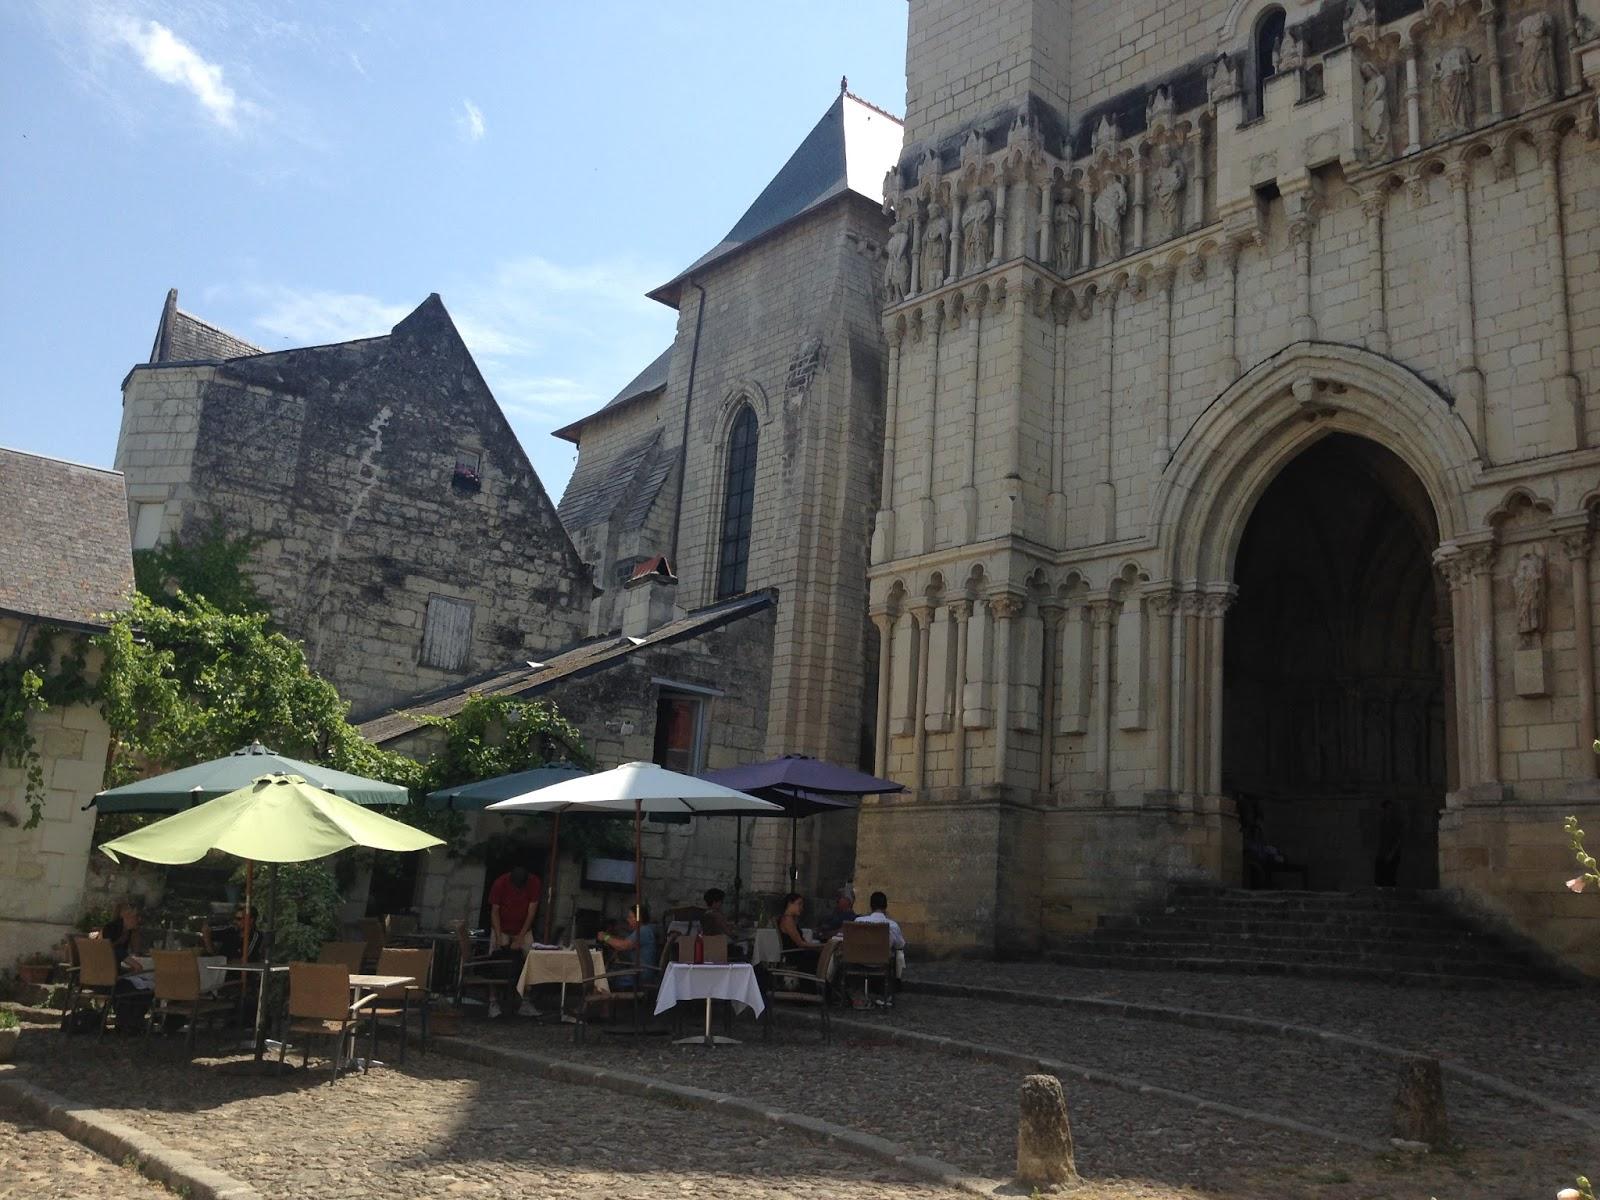 kolegiata w Candes Saint Martin ,restauracja na szlaku Loary